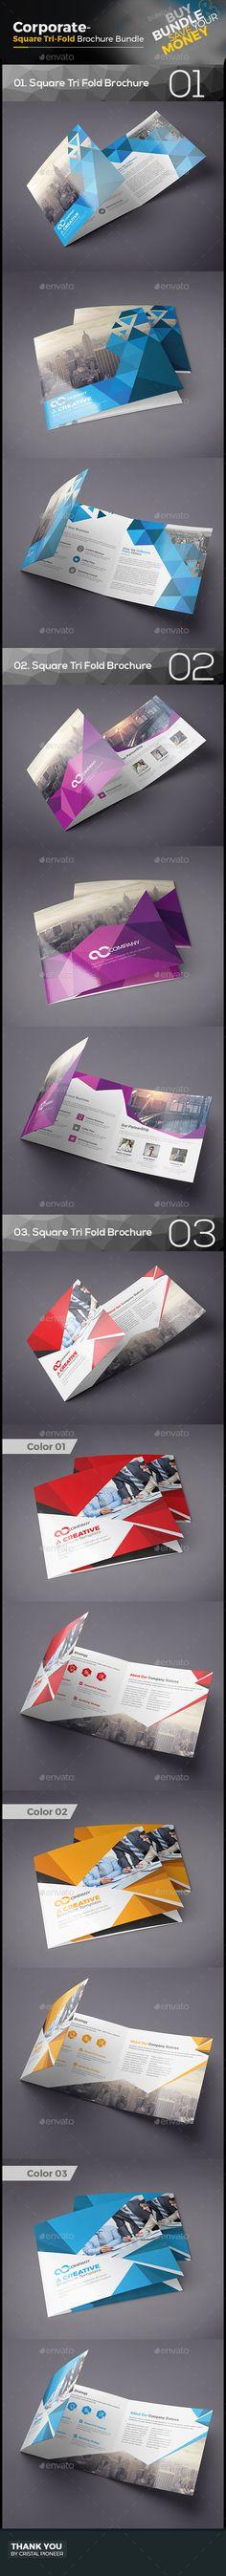 Square Tri Fold Brochure Bundle 3 in 1 - Corporate Brochure Design Template Vector EPS, Vector AI. Donwloda here: http://graphicriver.net/item/square-tri-fold-brochure-bundle-3-in-1/16500981?s_rank=9&ref=yinkira